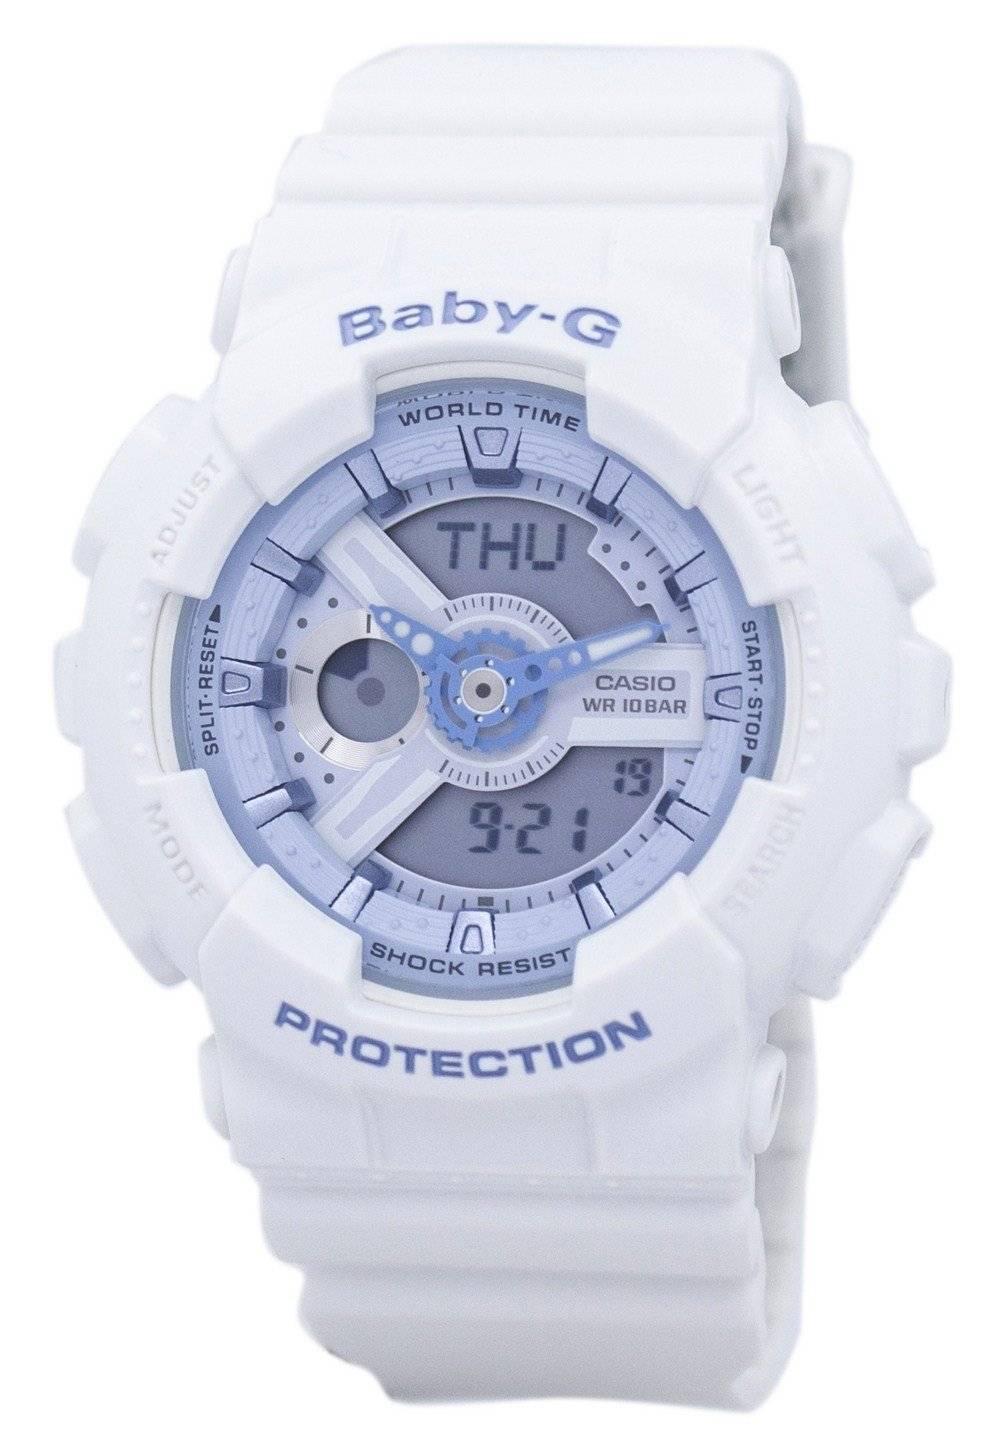 32160e60eb10 Reloj digital para mujer Casio Baby-G BA-110BE-7A BA110BE-7A Resistente a  los golpes.